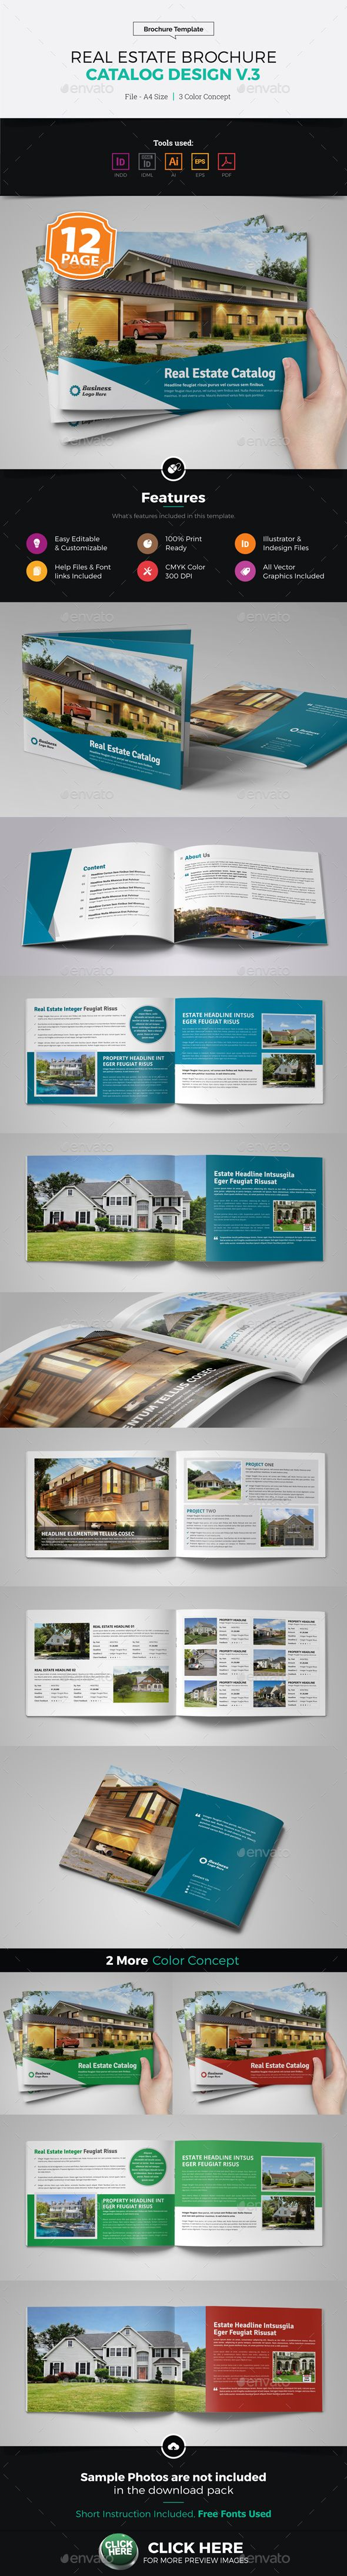 Real Estate Agency Brochure Catalog v3 — Vector EPS #land brochure #Land Business • Available here → https://graphicriver.net/item/property-sale-real-estate-brochure-catalog-v3/8187610?ref=pxcr